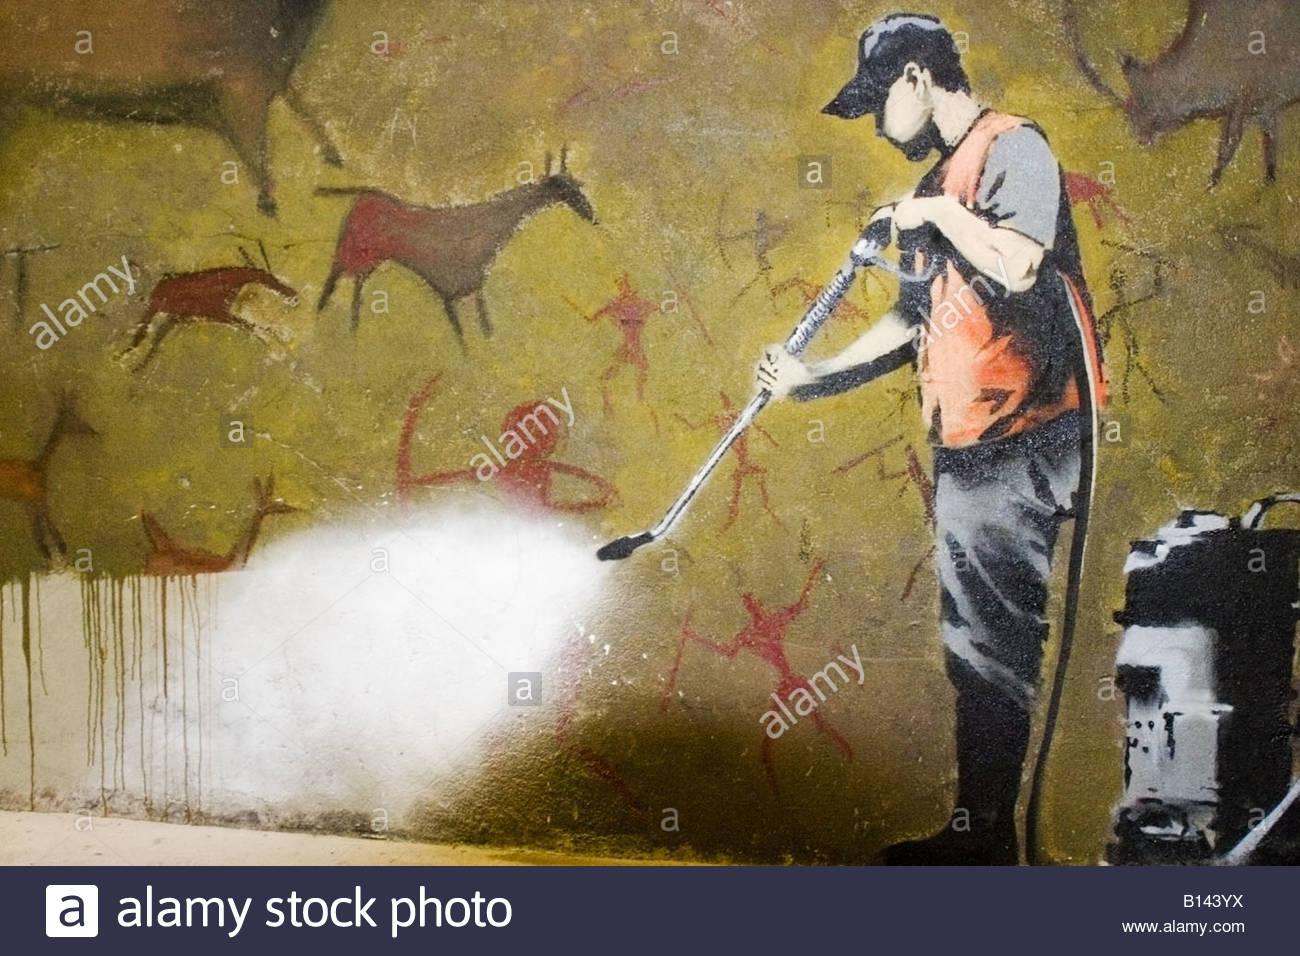 BANKSY Graffiti Street Art Wall Decor Print cave painting